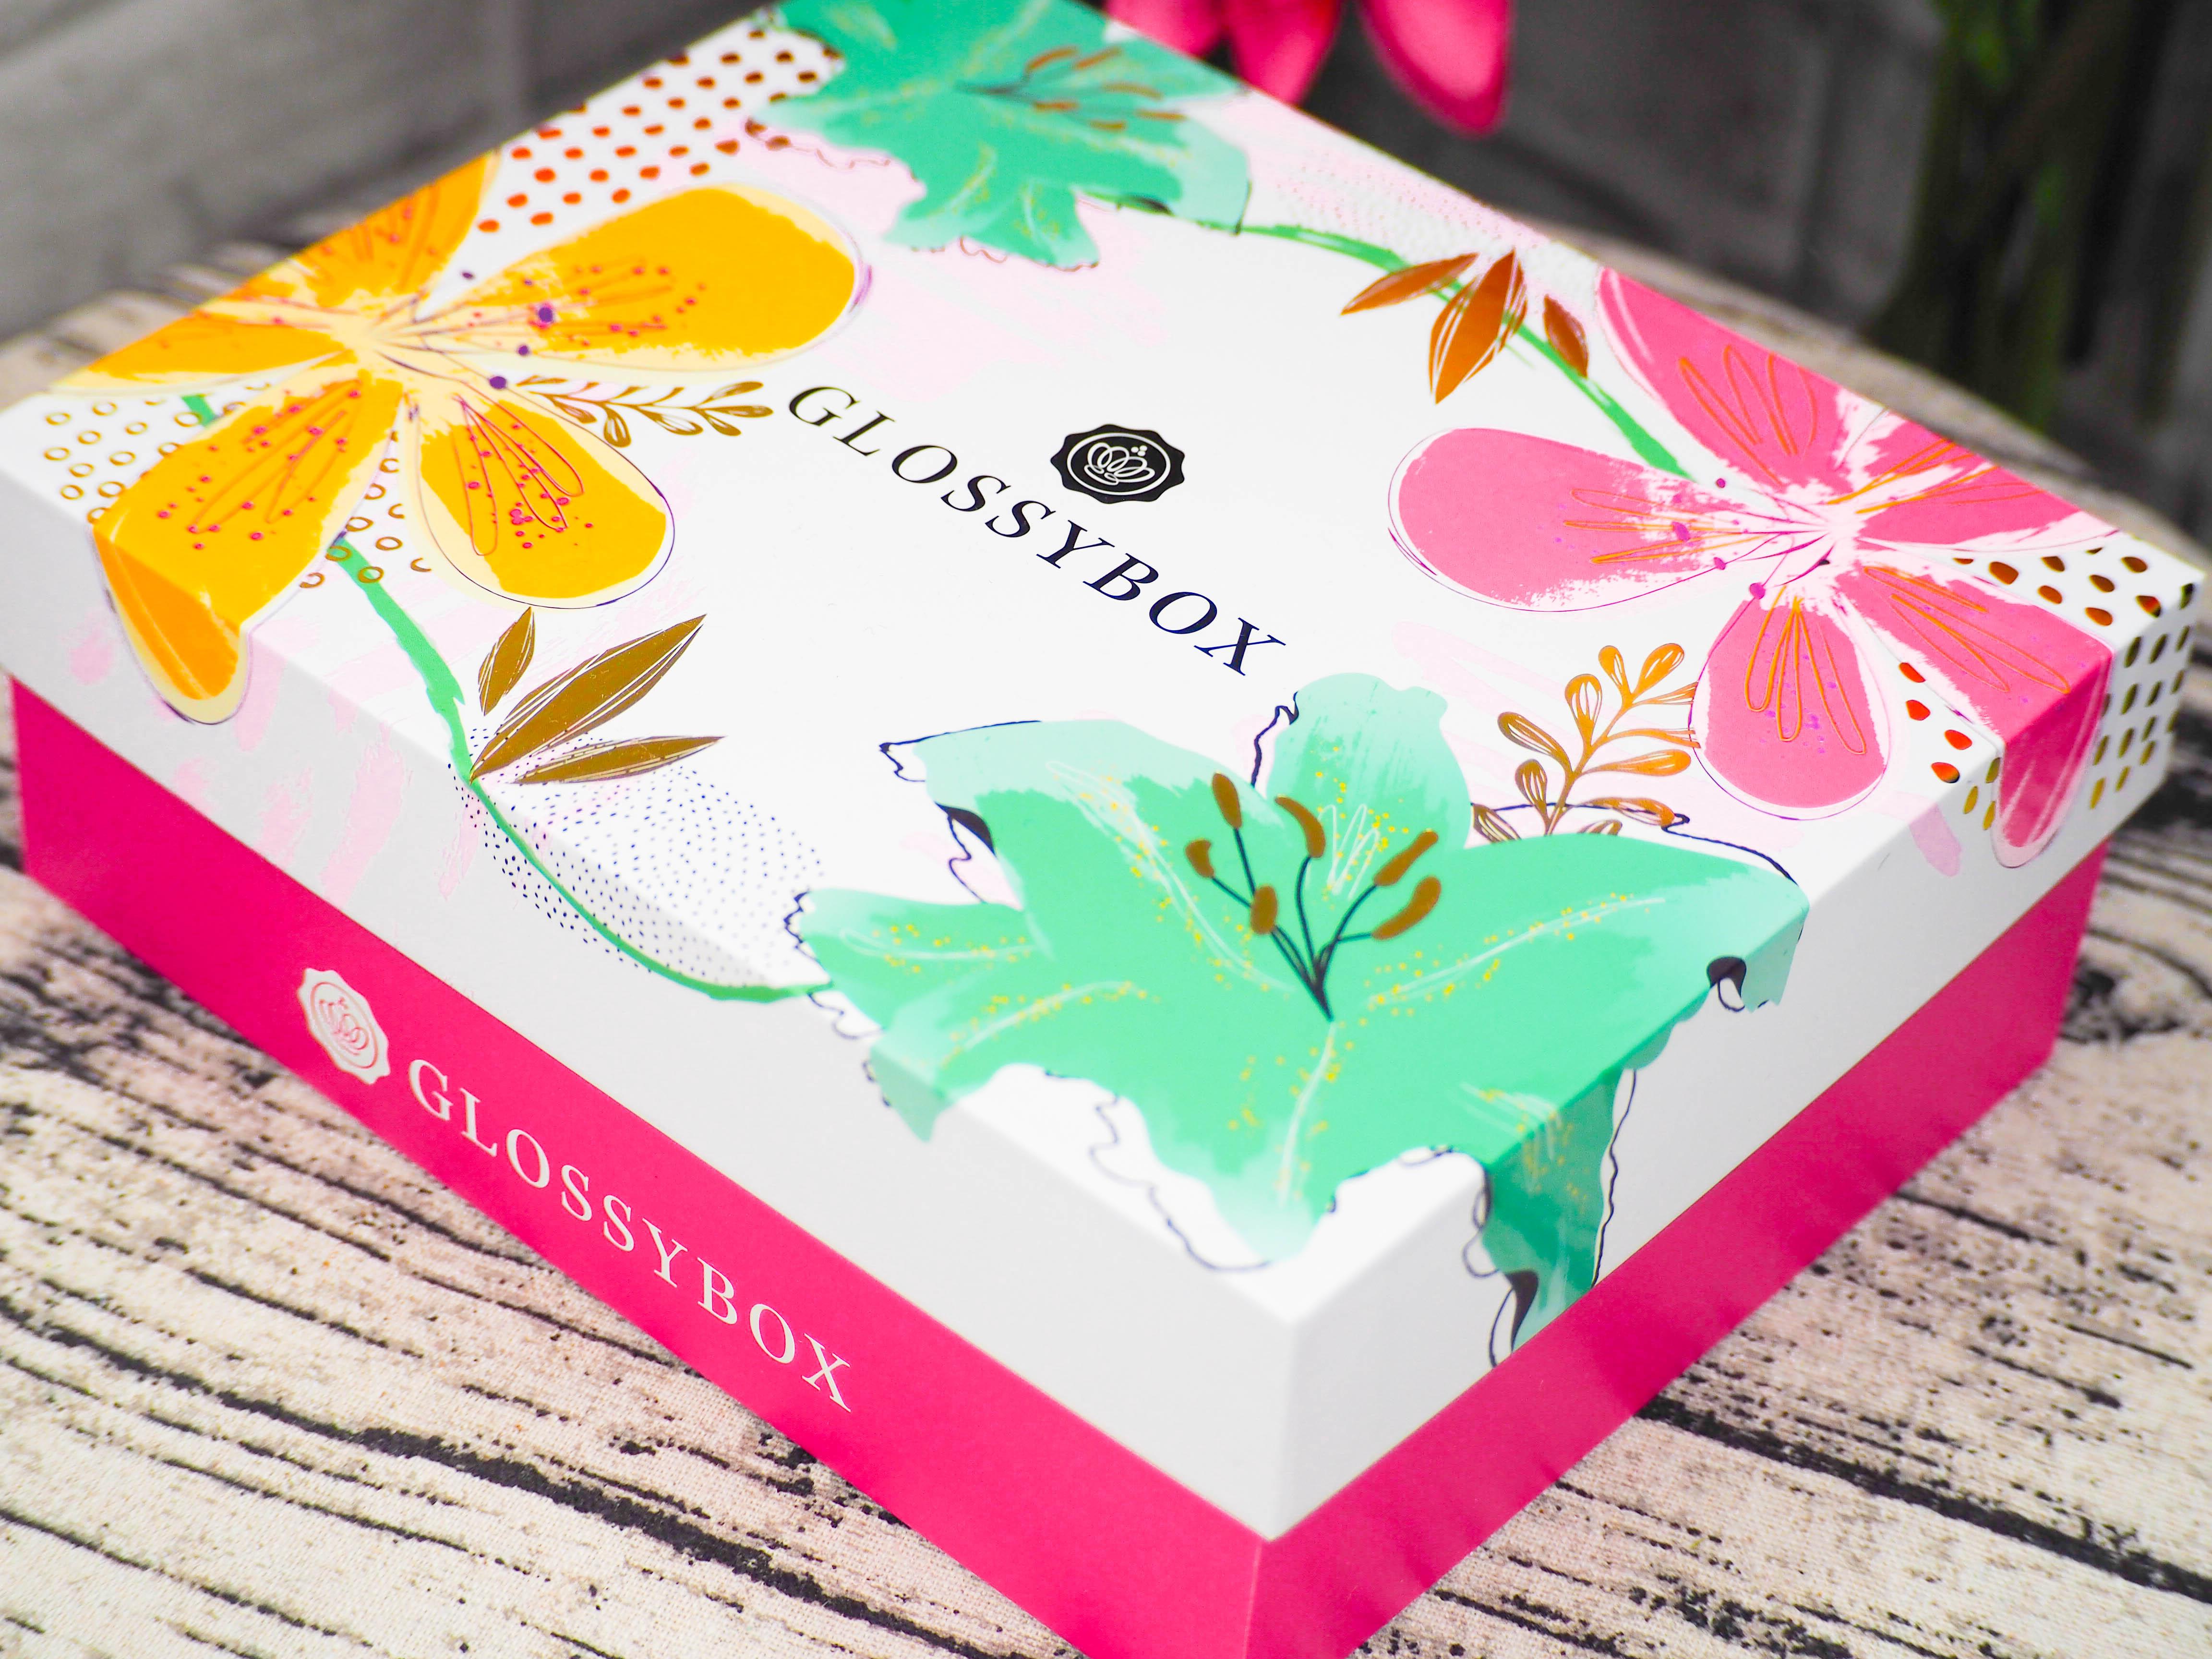 Glossybox April 2019